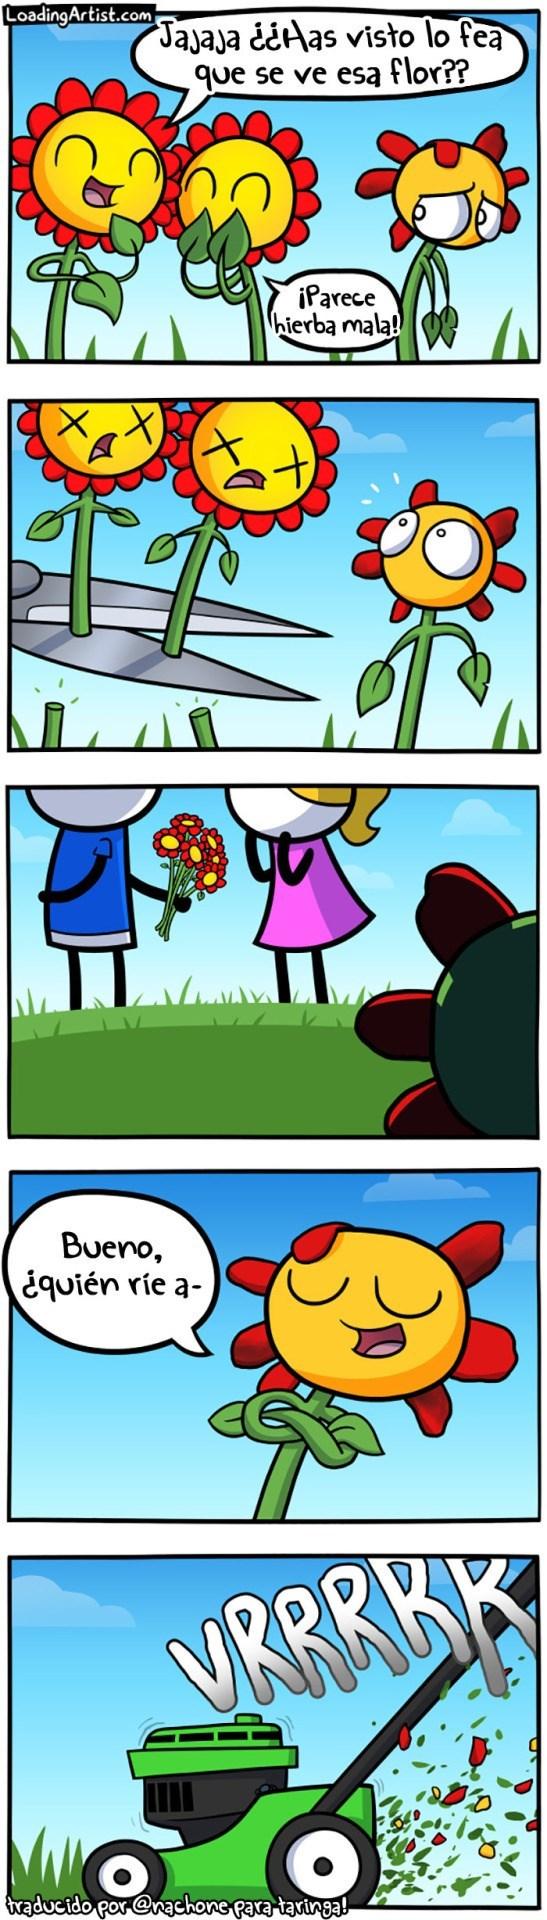 flor fea se burla de la suerte de las lindas